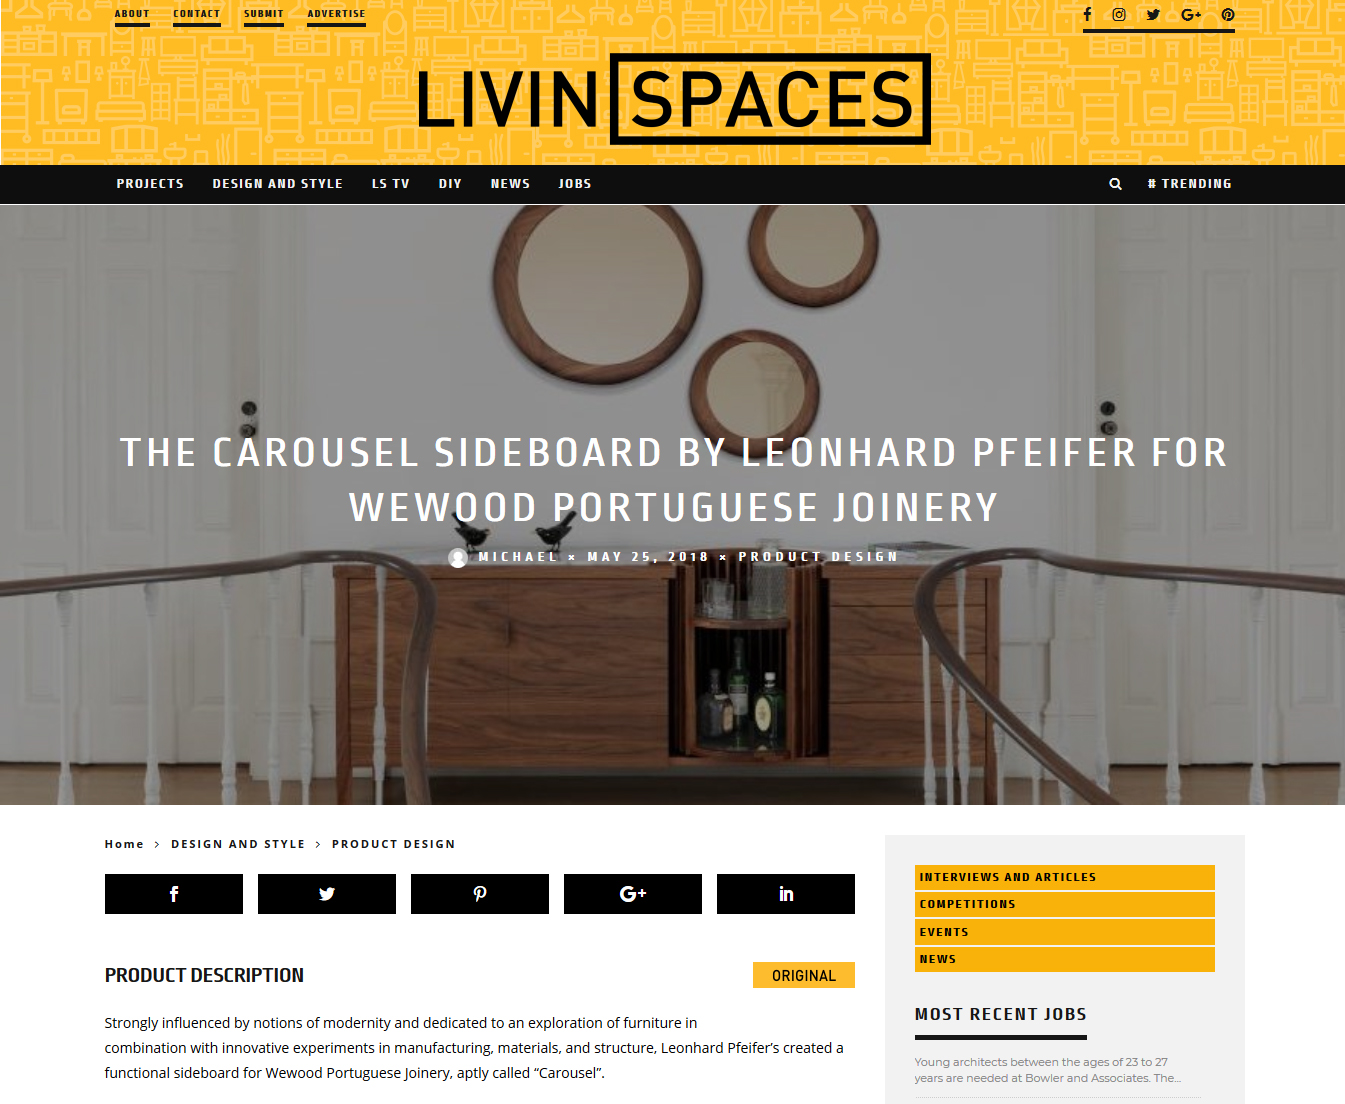 Leonhard-Pfeifer_Living-Spaces_Press_snippet.jpg